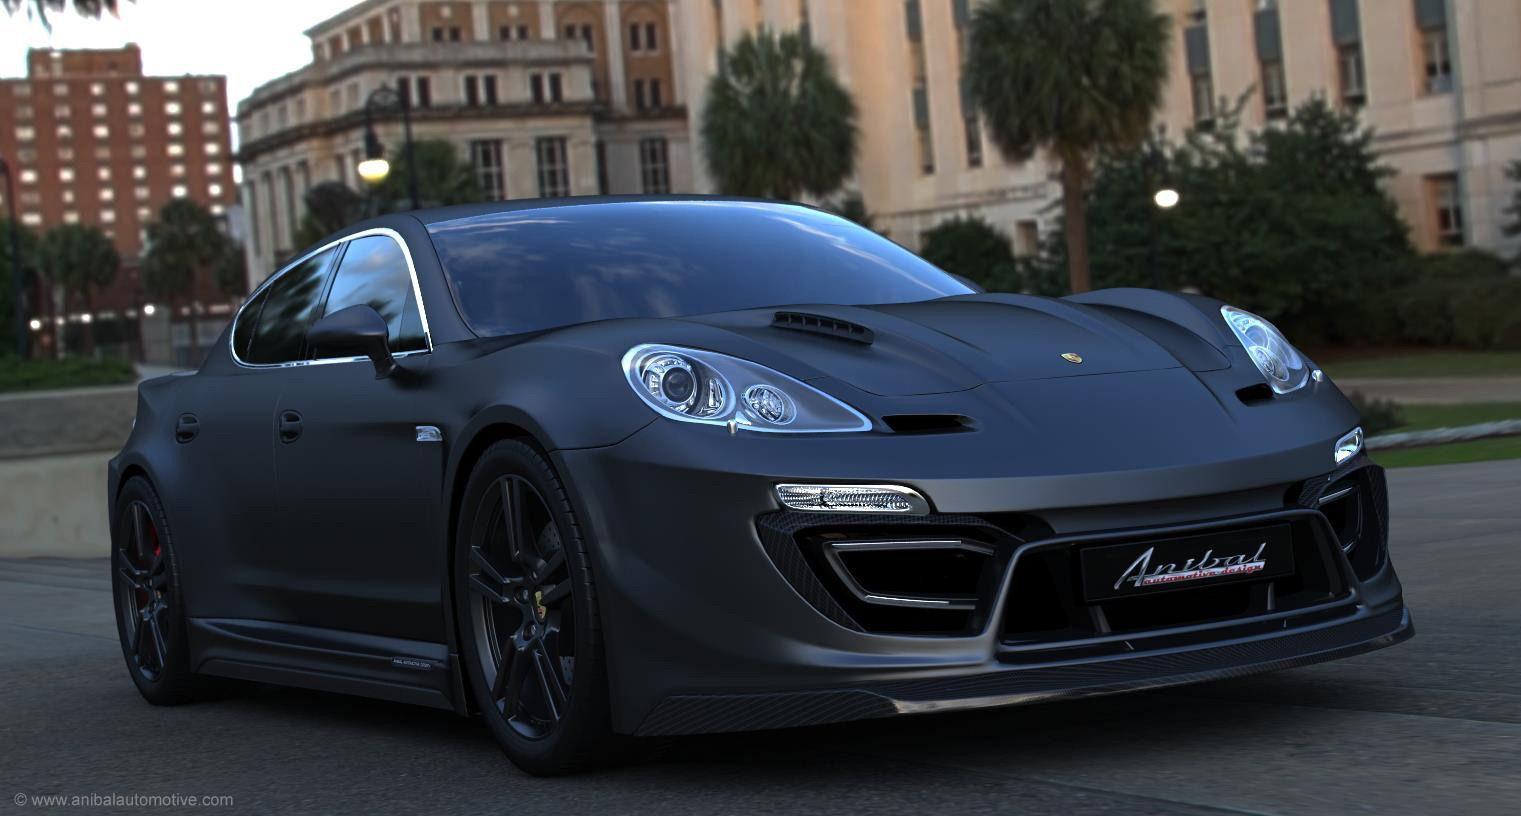 Imagem de http://s1.cdn.autoevolution.com/images/news/gallery/porsche-panamera-by-anibal-looks-like-a-911-four-door-photo-gallery_4.jpg.